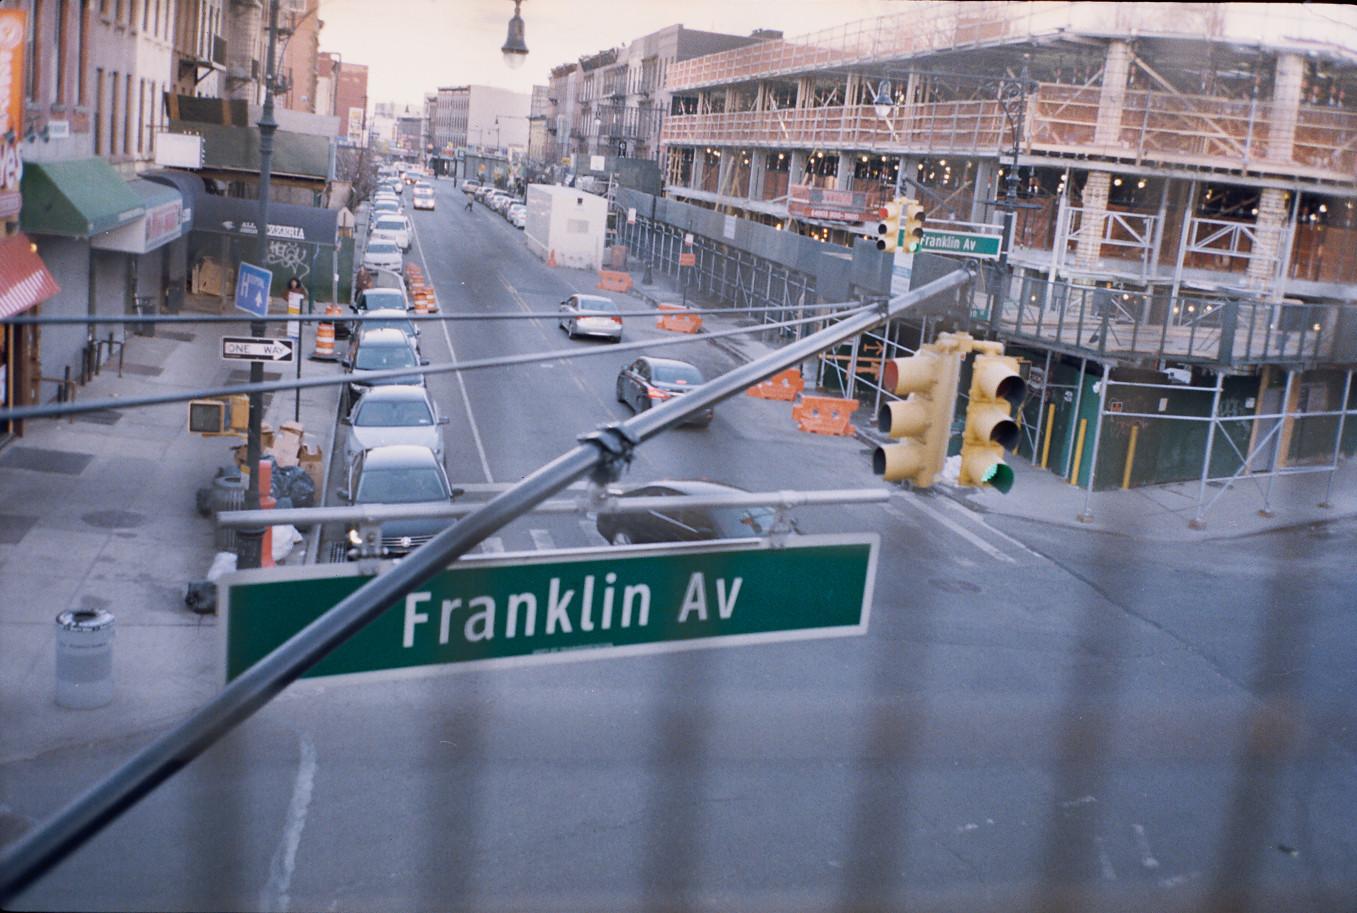 CROSSROAD-FRANKLYN-fromthemetro.jpg